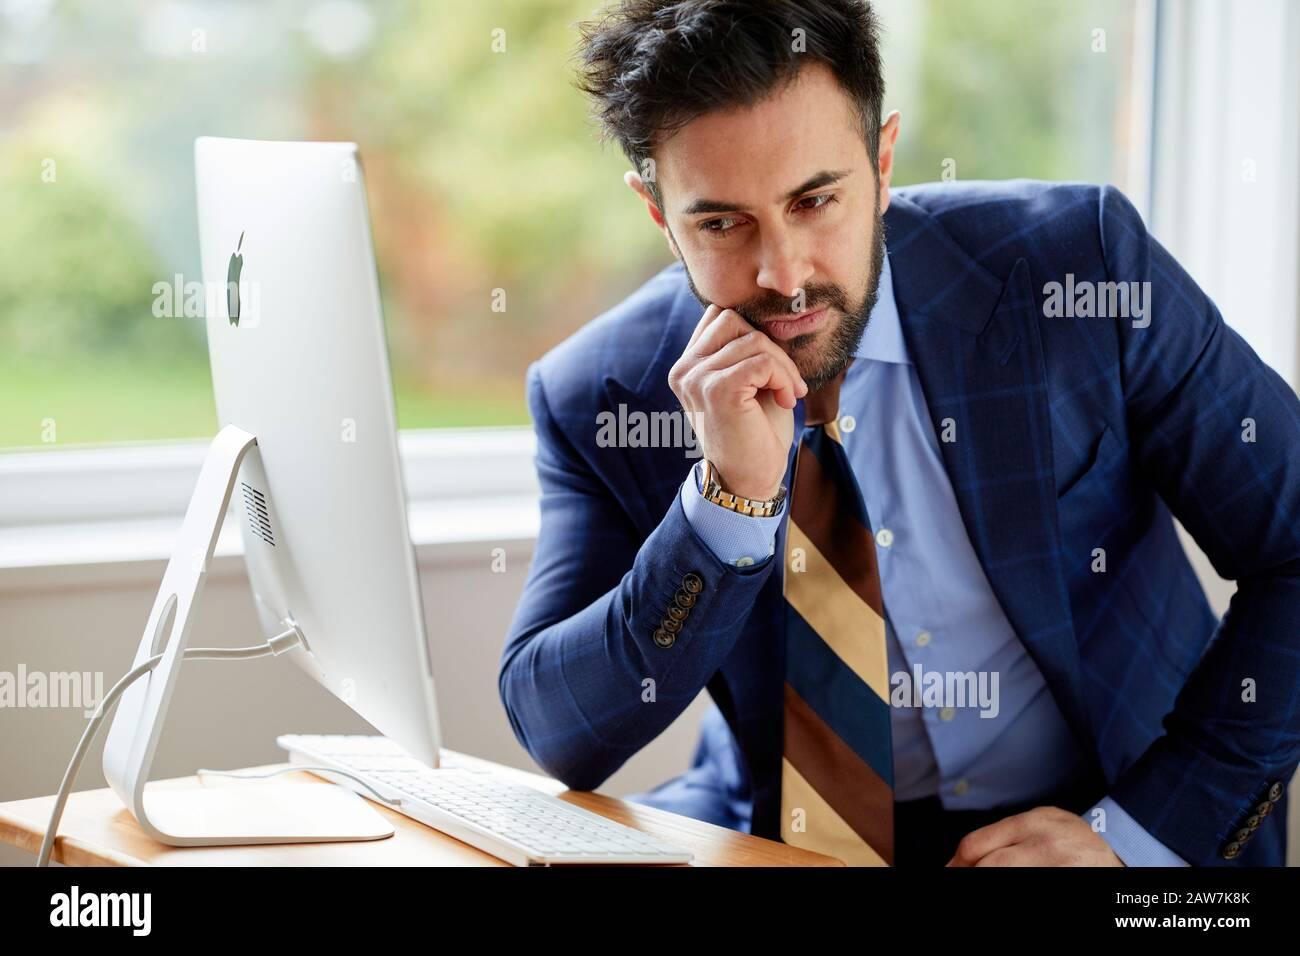 Man sat at computer thoughtful Stock Photo